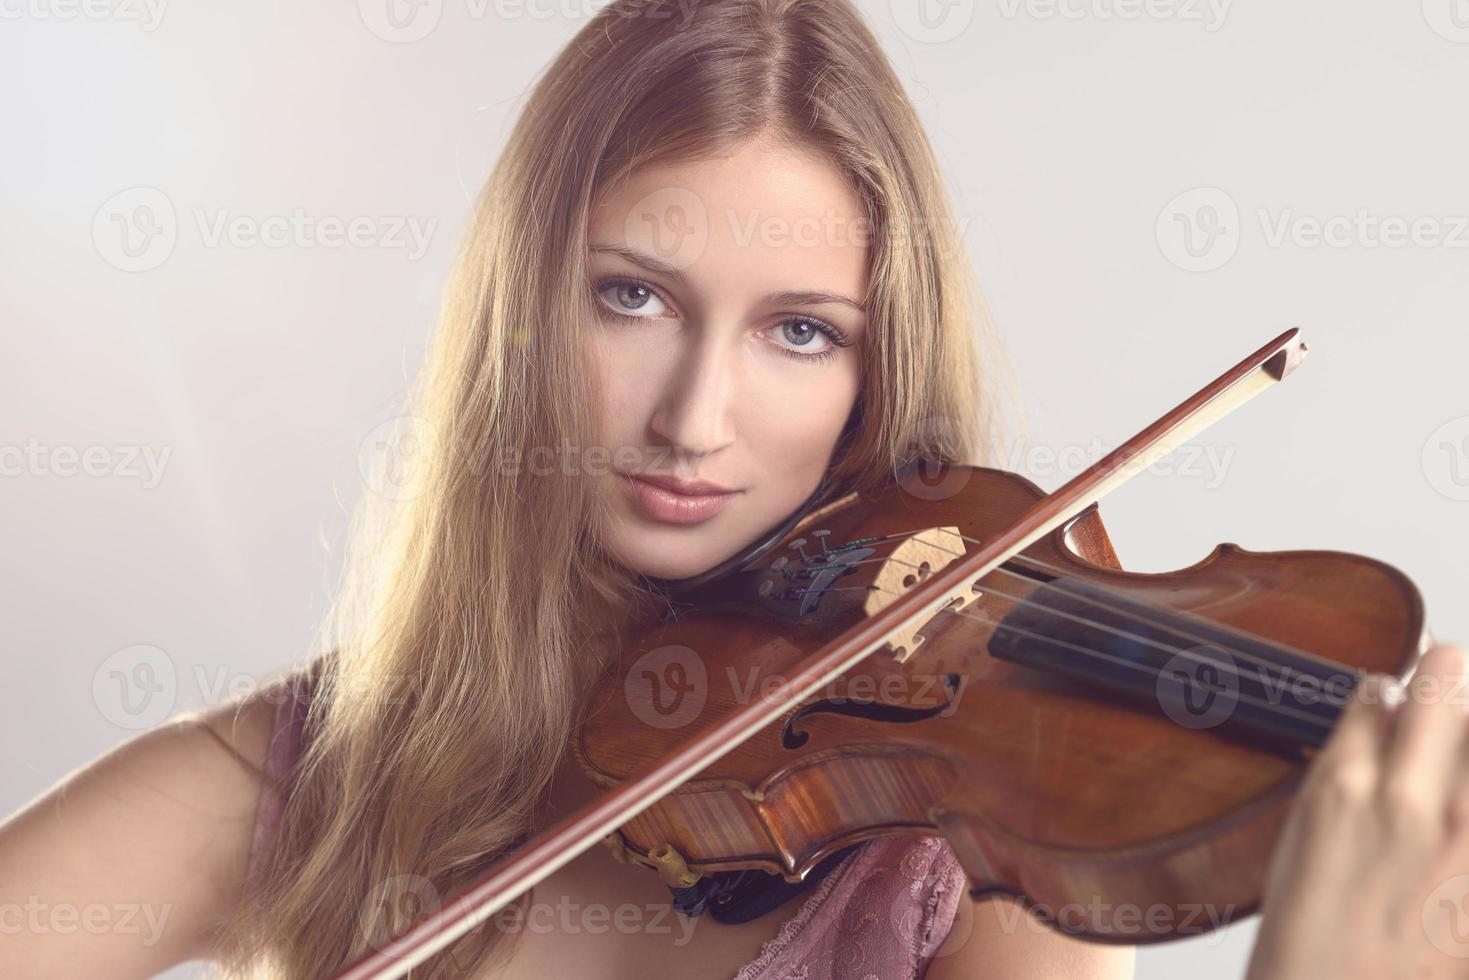 jovem violinista tocando violino foto